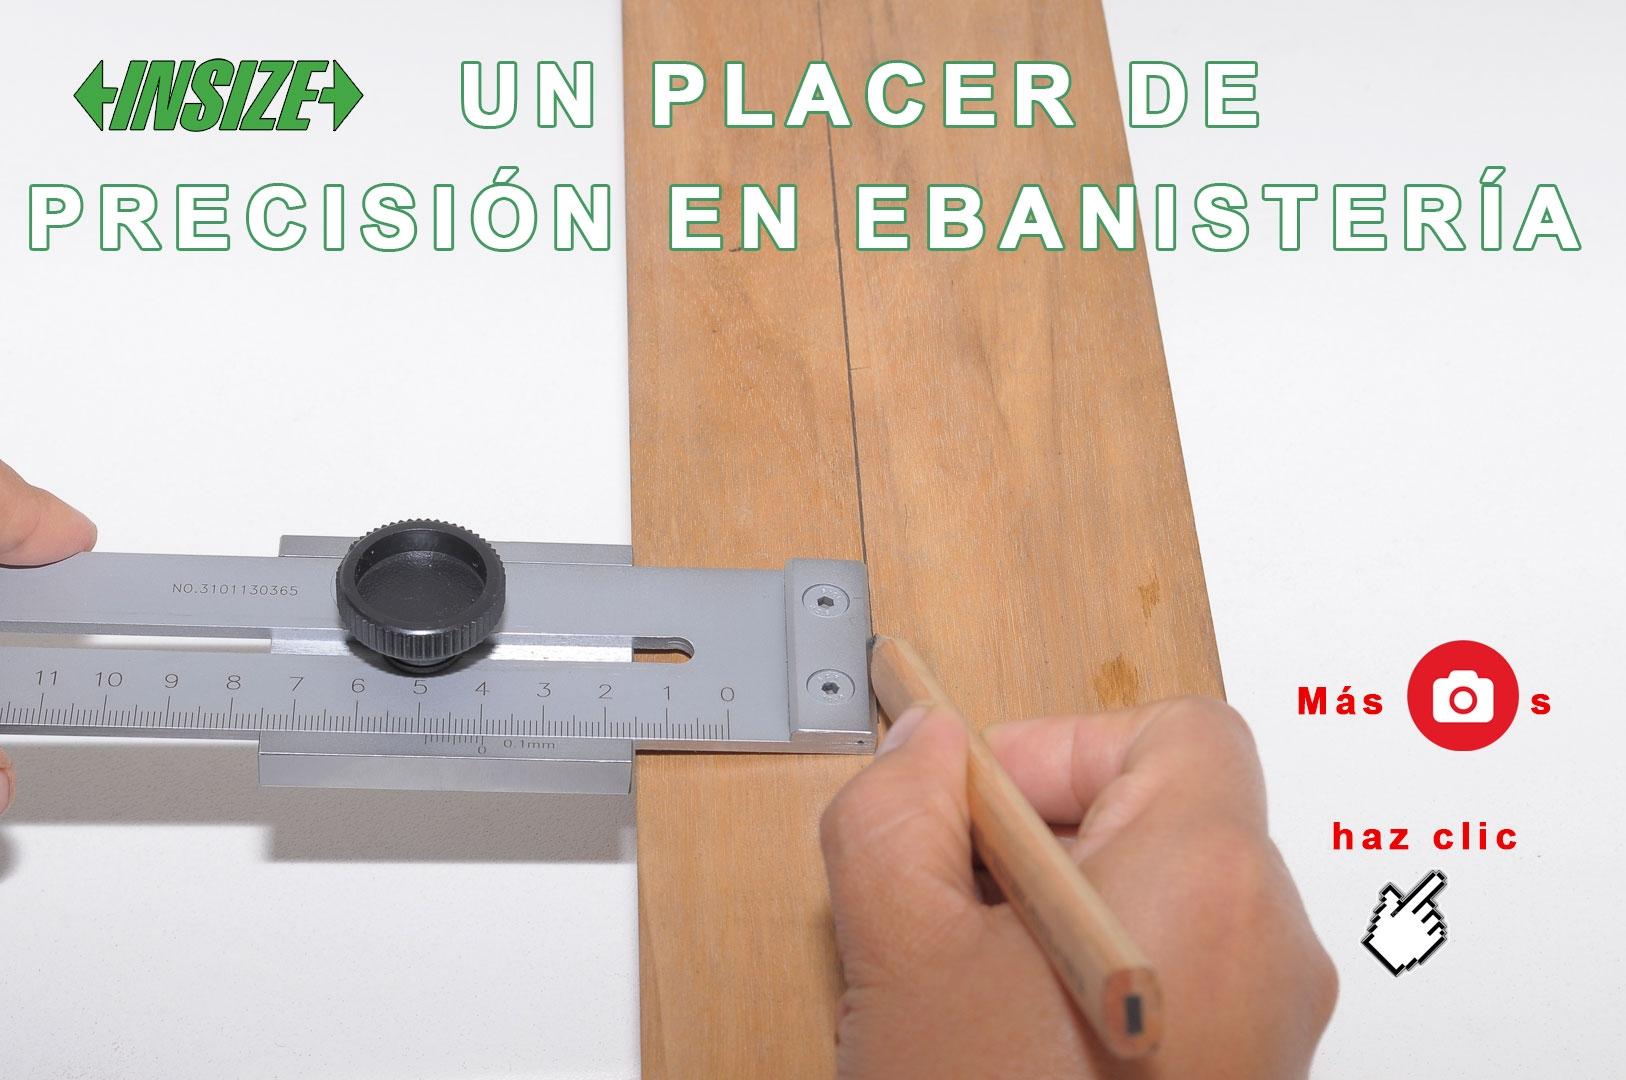 7120-200A-Gramil regla de precision para marcar 0-200mm INSIZE 7120-200A-max-1.